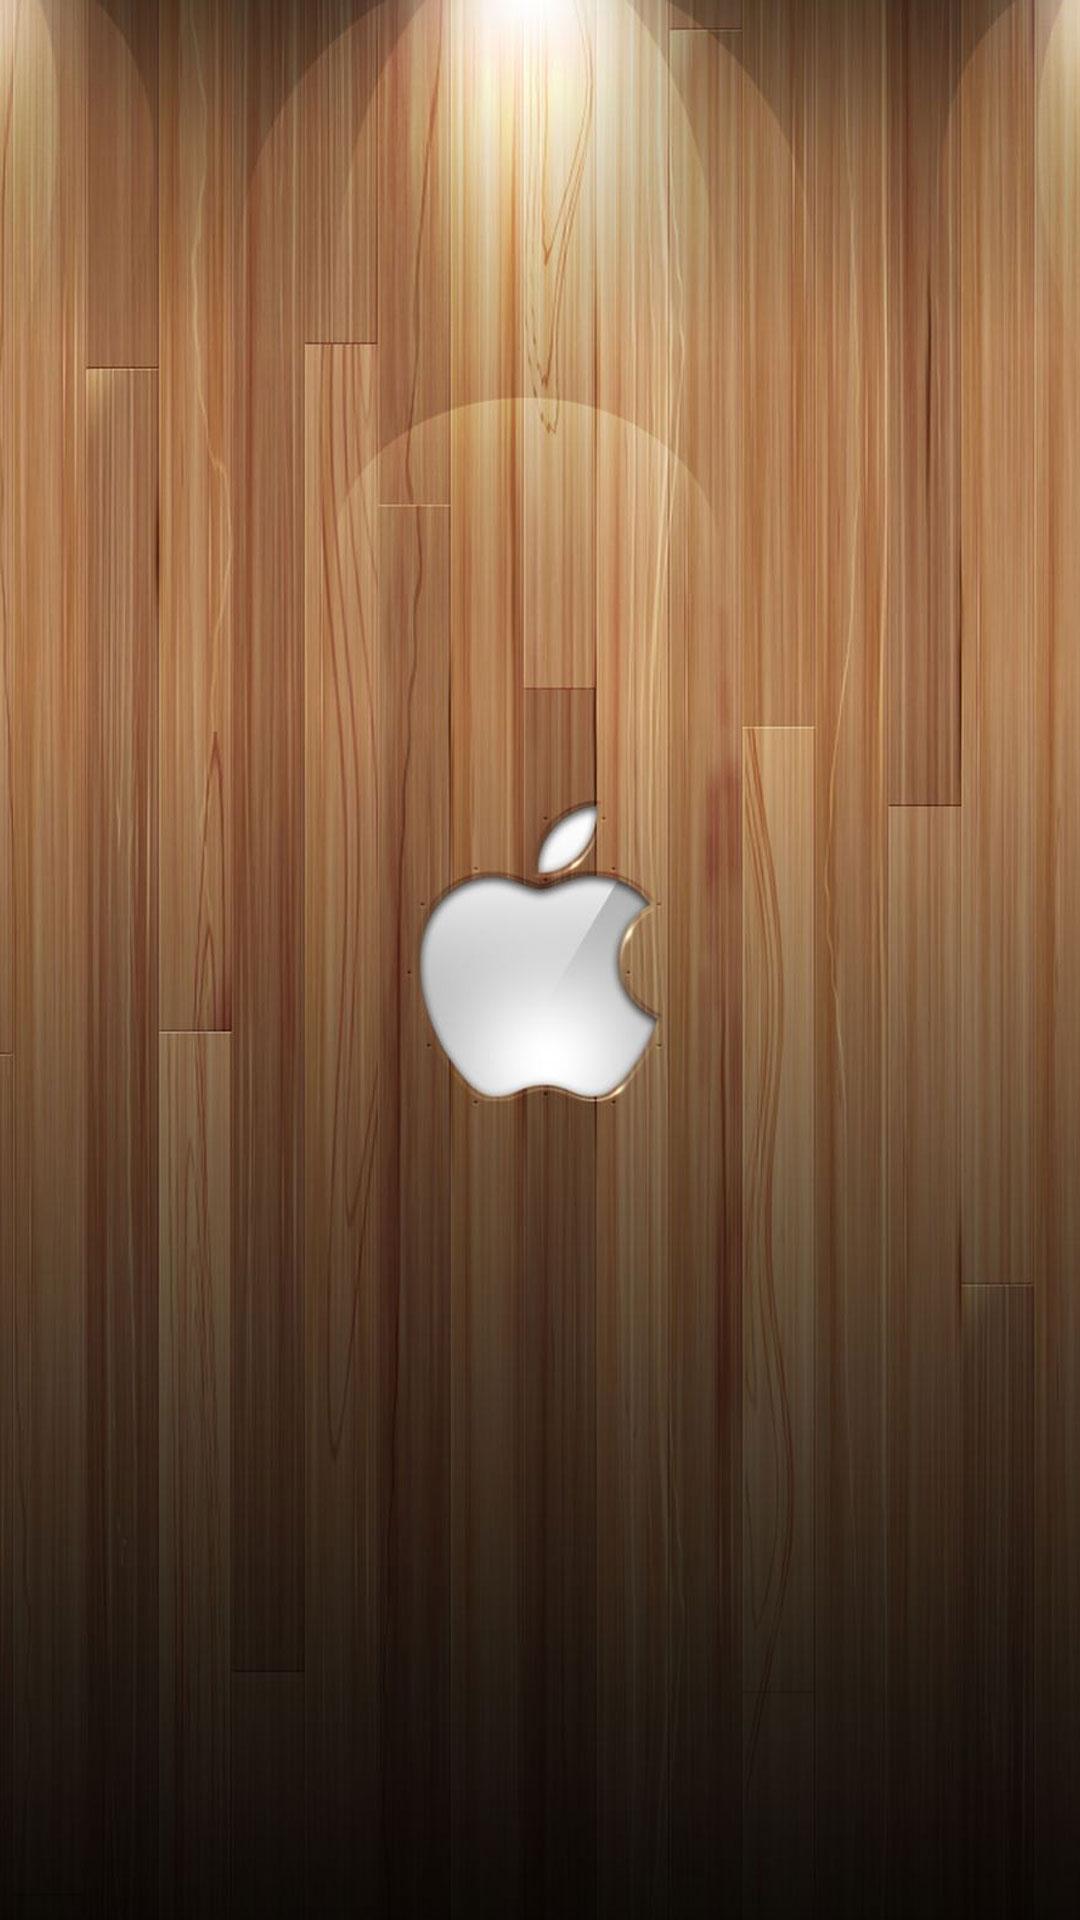 uploads201409Beautiful Apple iPhone 6 Plus Wallpaper Retina1jpg 1080x1920